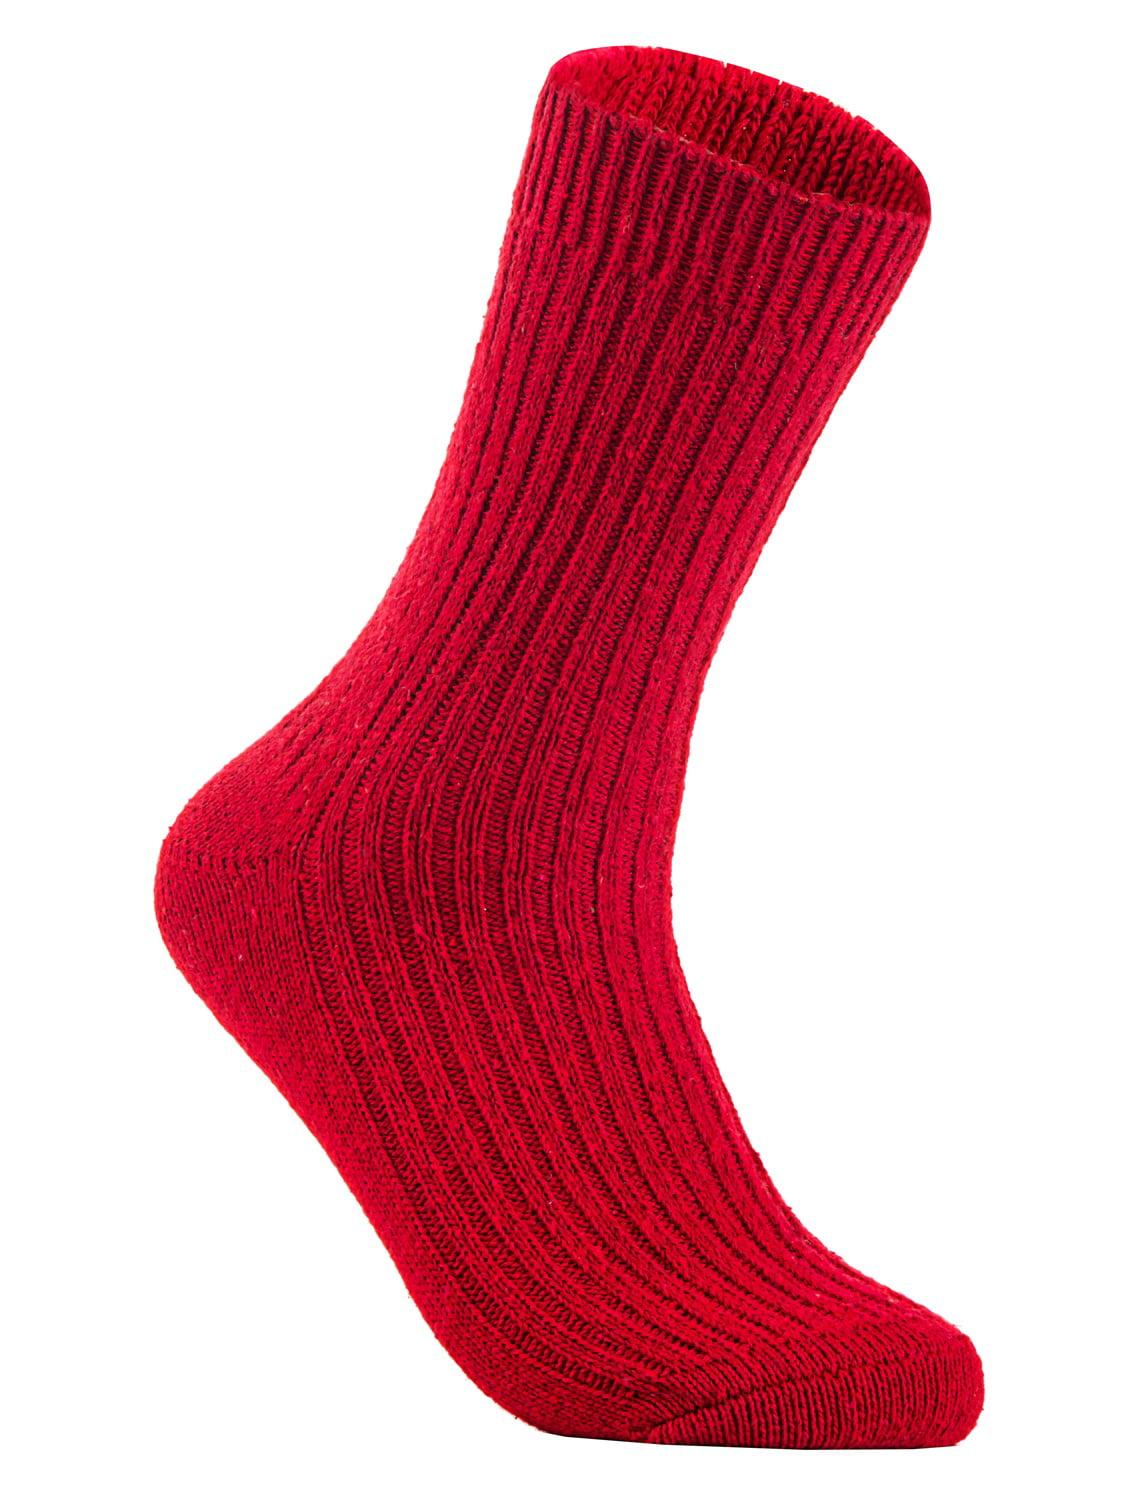 Lian Style Big Girls 1 Pair Knitted Wool Crew Socks FS03 Size XL (Assorted)